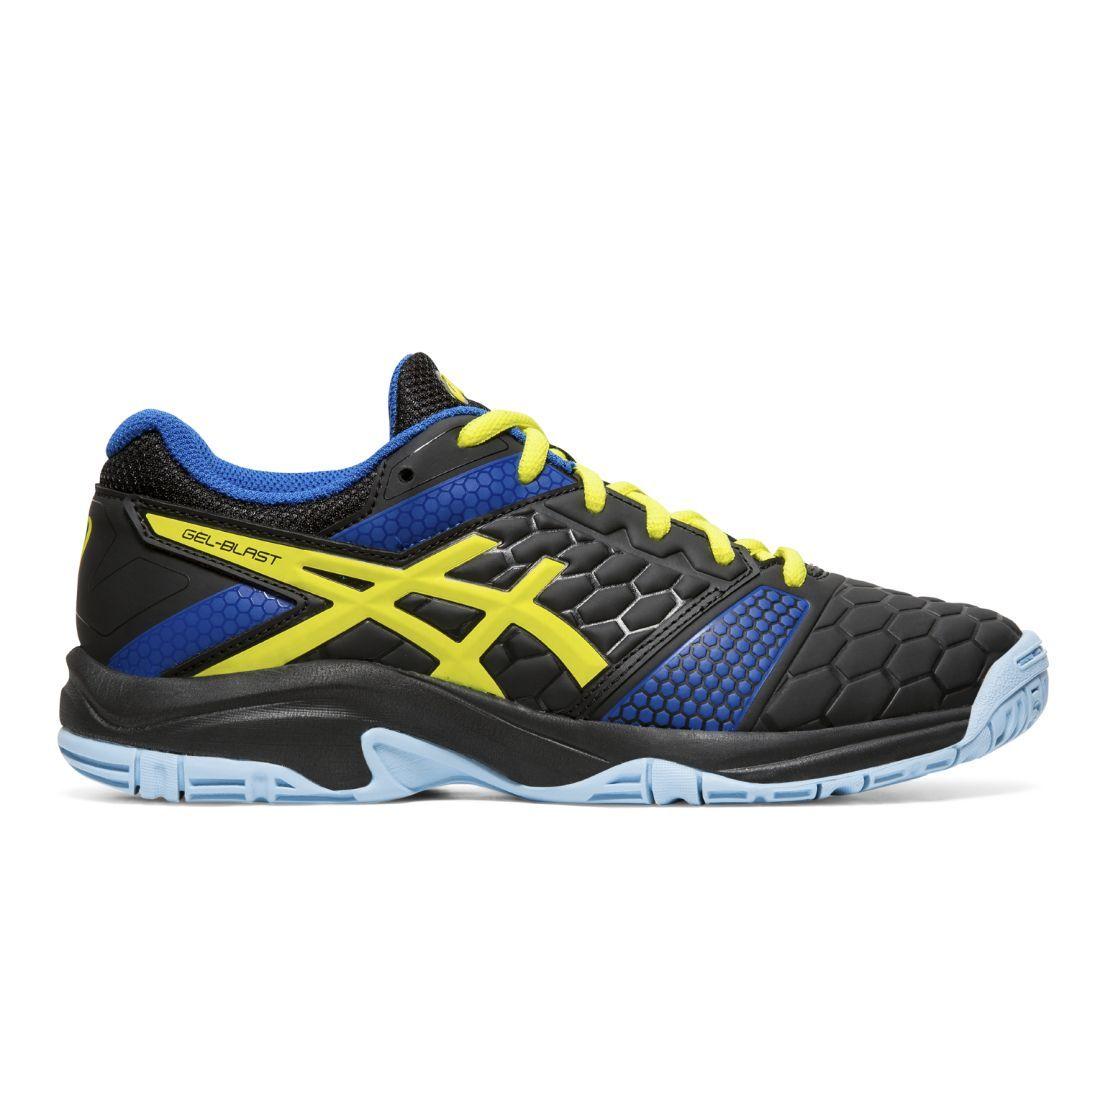 Asics GEL BLAST 7 GS Handball shoes